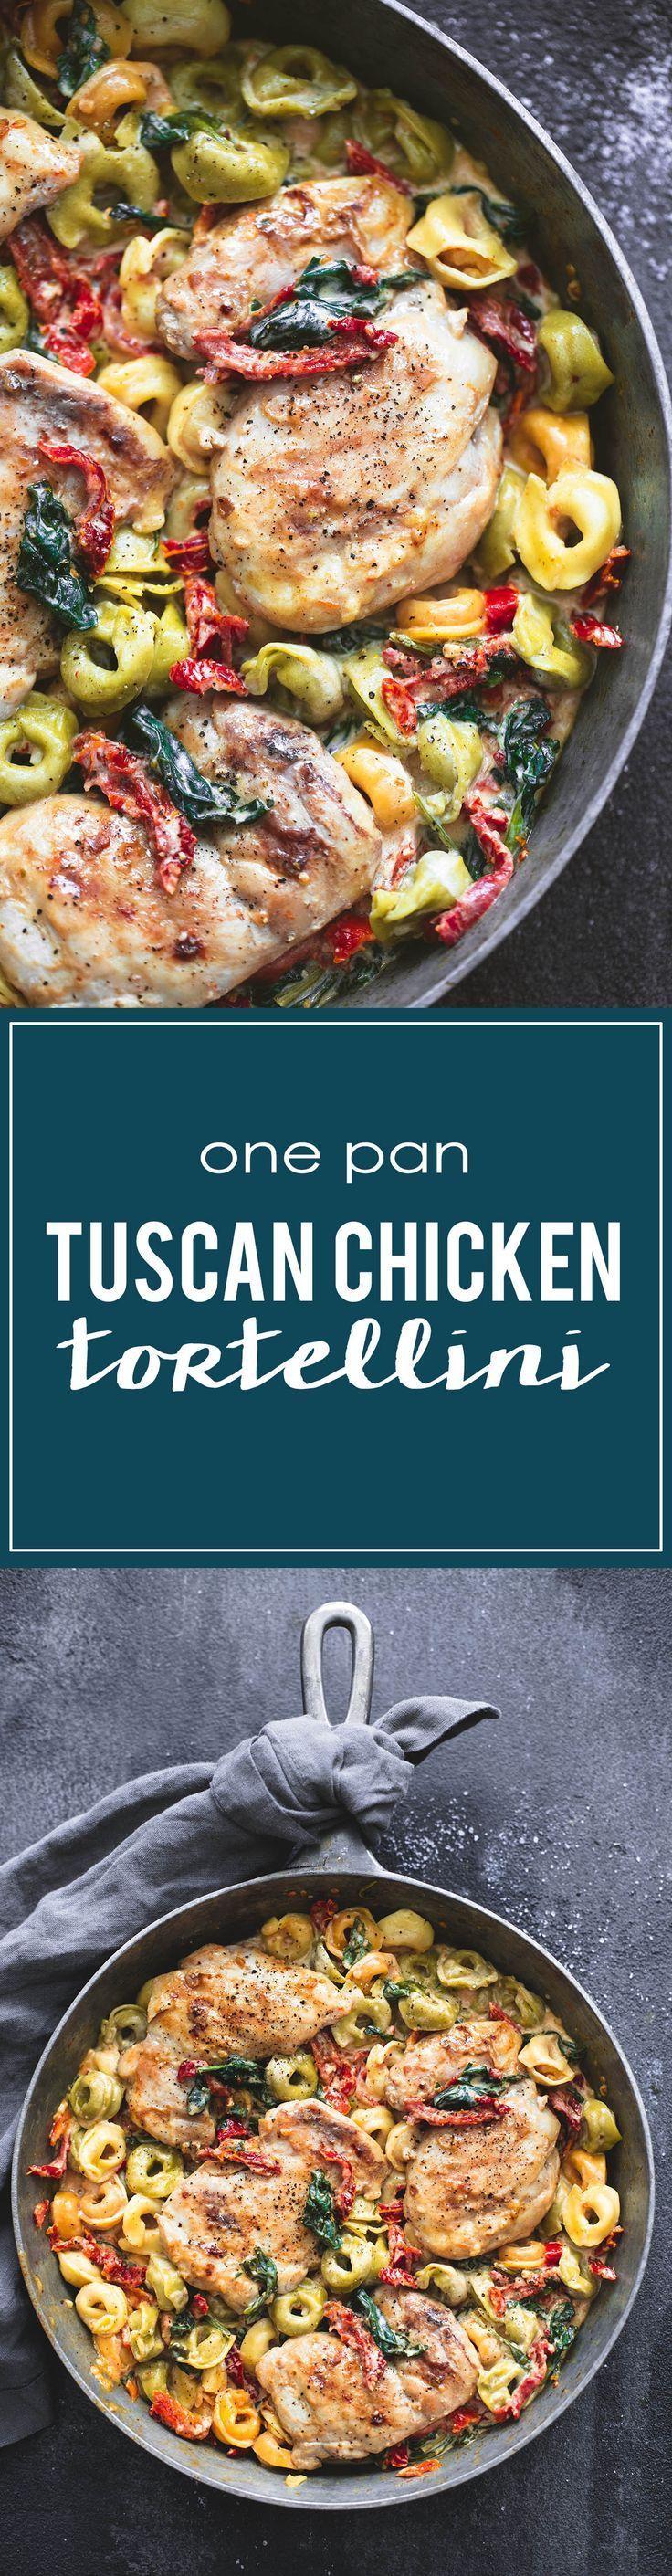 One Pan Tuscan Chicken Tortellini | http://lecremedelacrumb.com